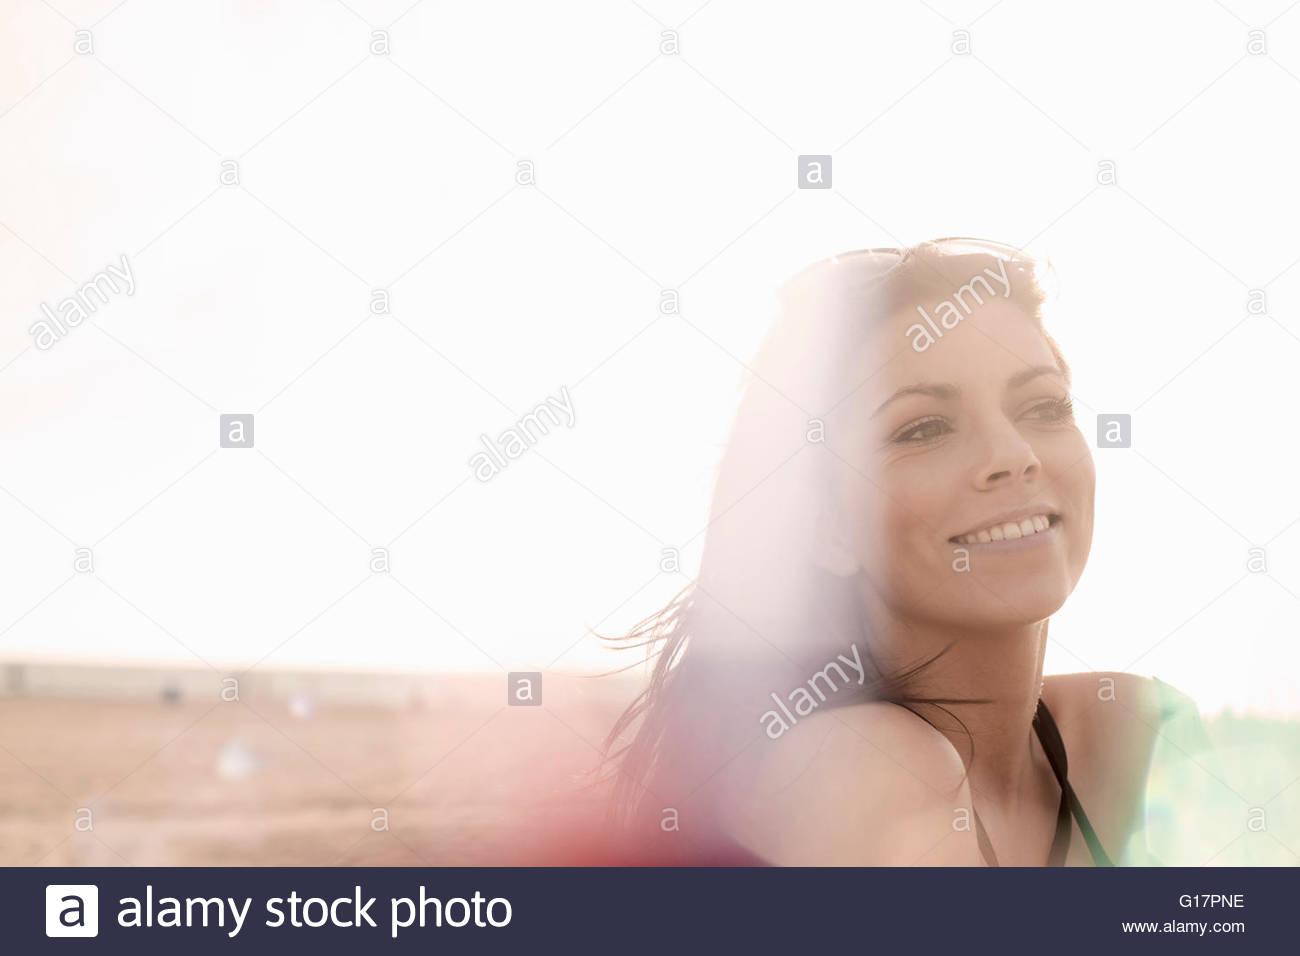 Junge Frau mit langen braunen Haaren am Beach, Santa Monica, Kalifornien, USA Stockbild